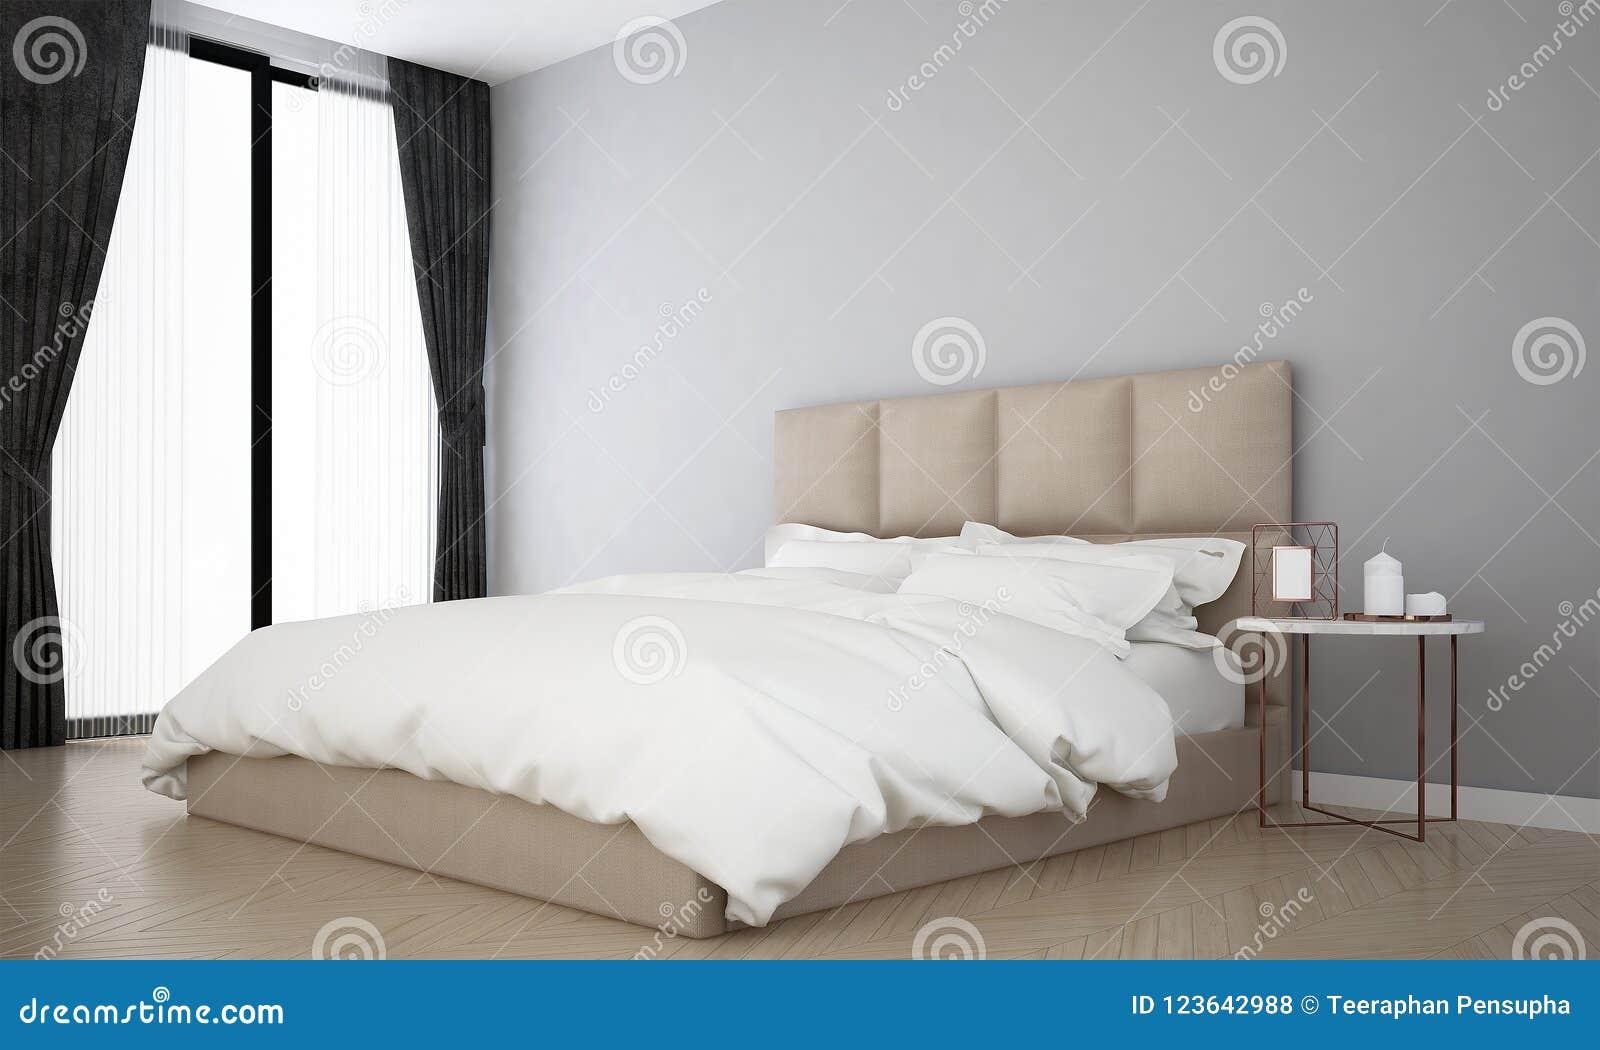 Bedroom Wall Design Pattern